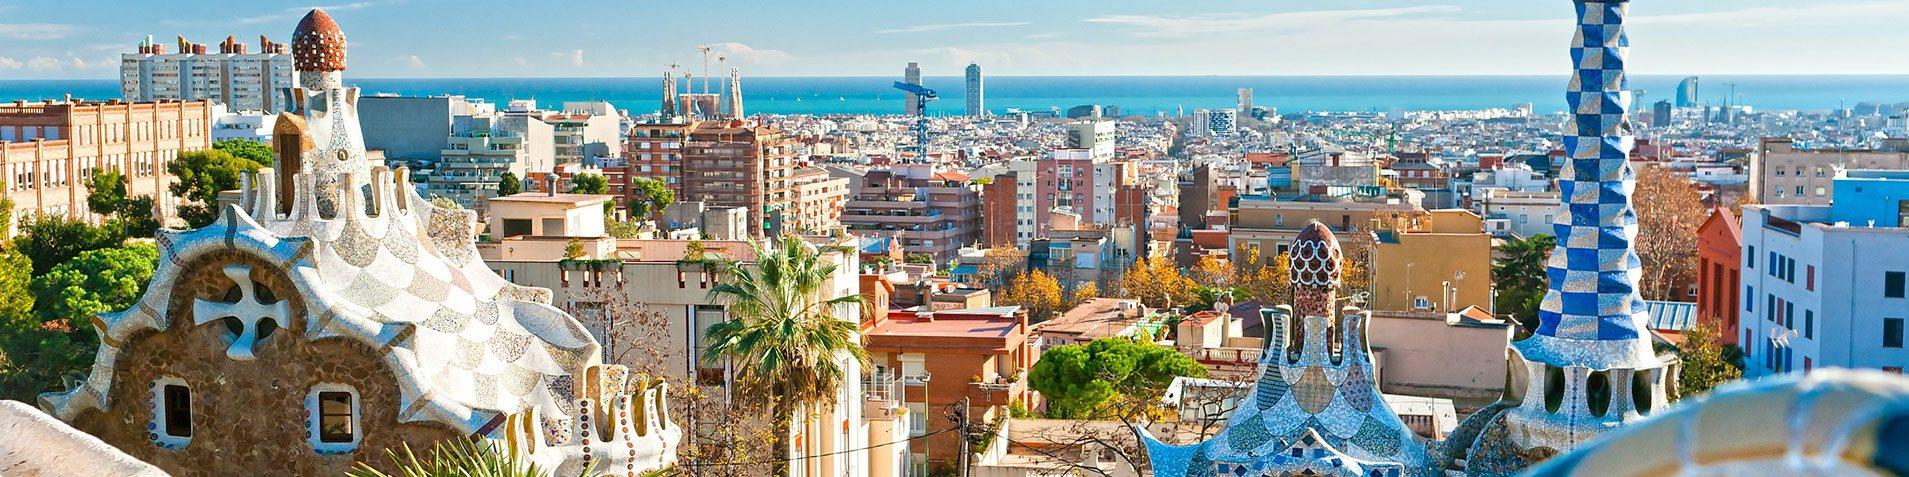 ruta-barcelona-slide